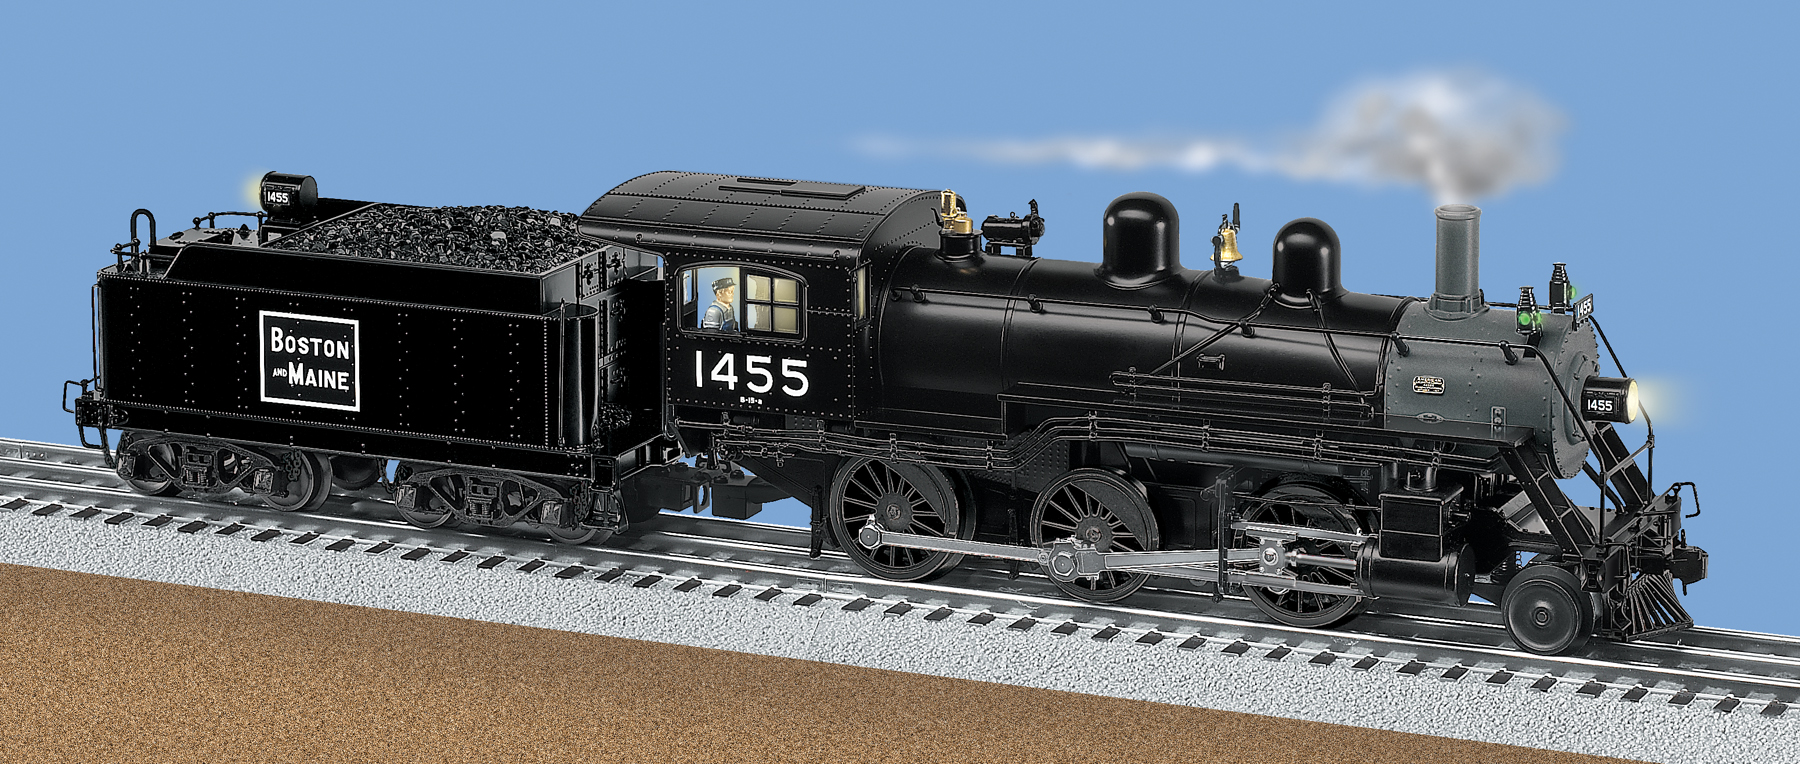 lionel train transformer wiring diagram [ 1800 x 764 Pixel ]